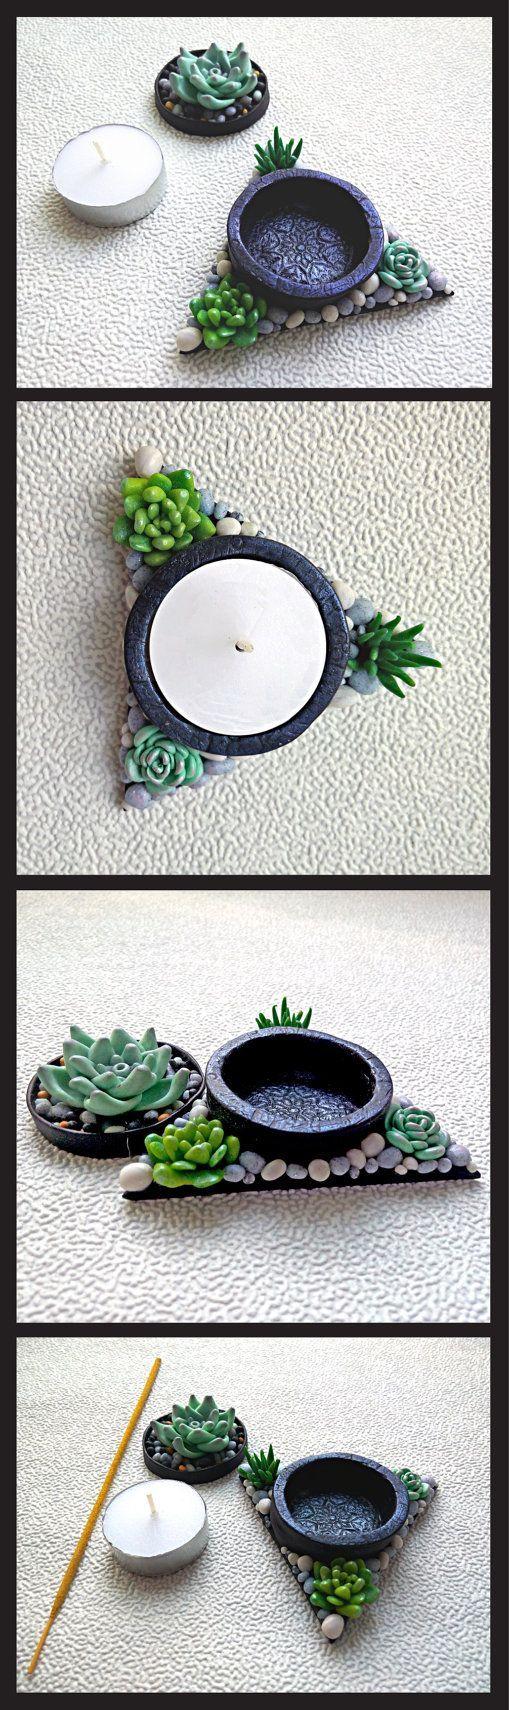 Set of Candle holder and Incense stick burner Succulent decor Tea light candle holder Ash catcher Incense supply Aromatherapy Yoga gift